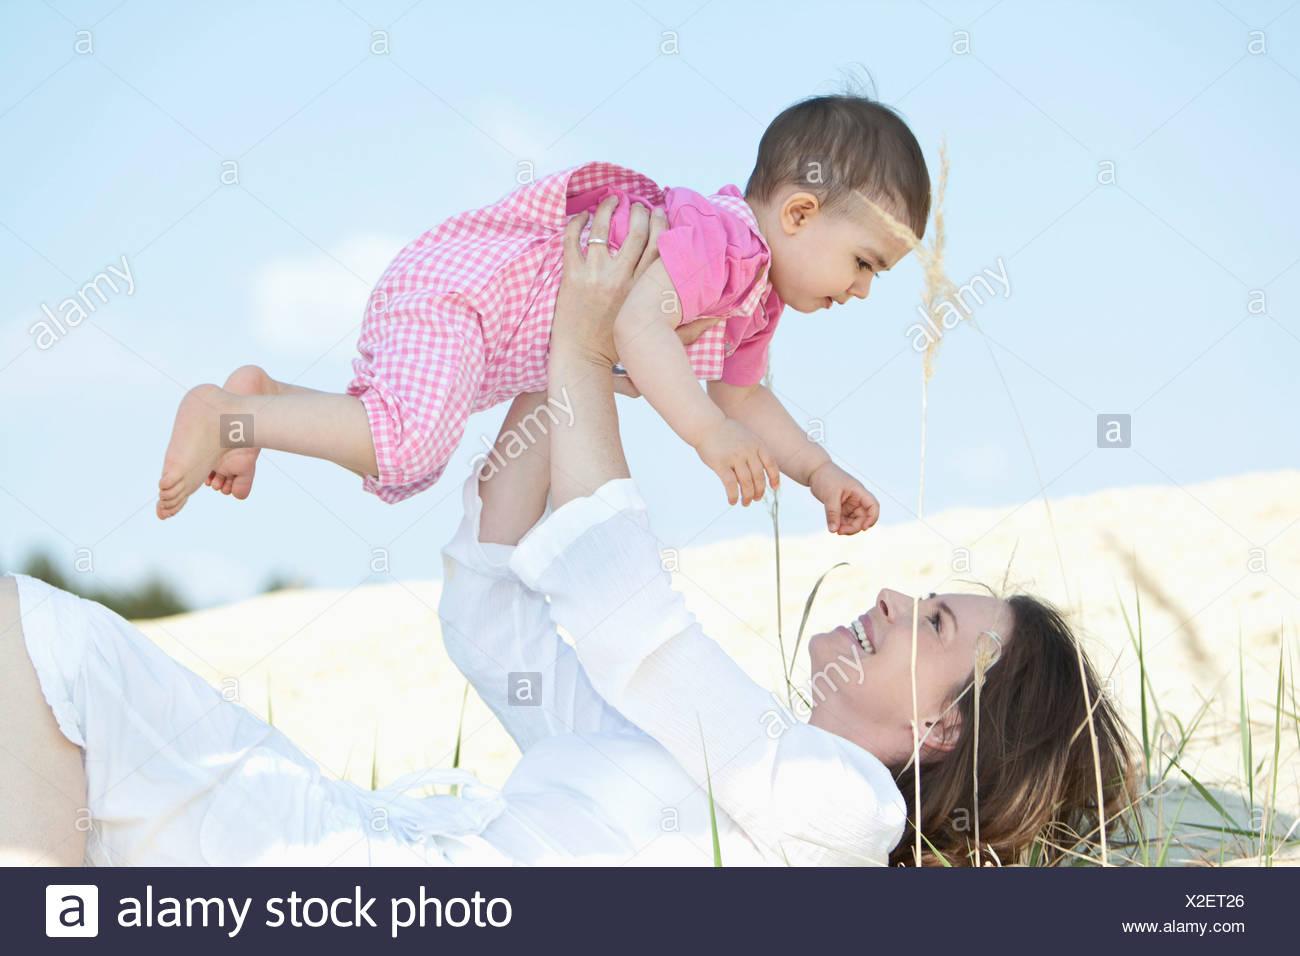 Germany, Bavaria, Mother lying and holding aloft baby girl - Stock Image